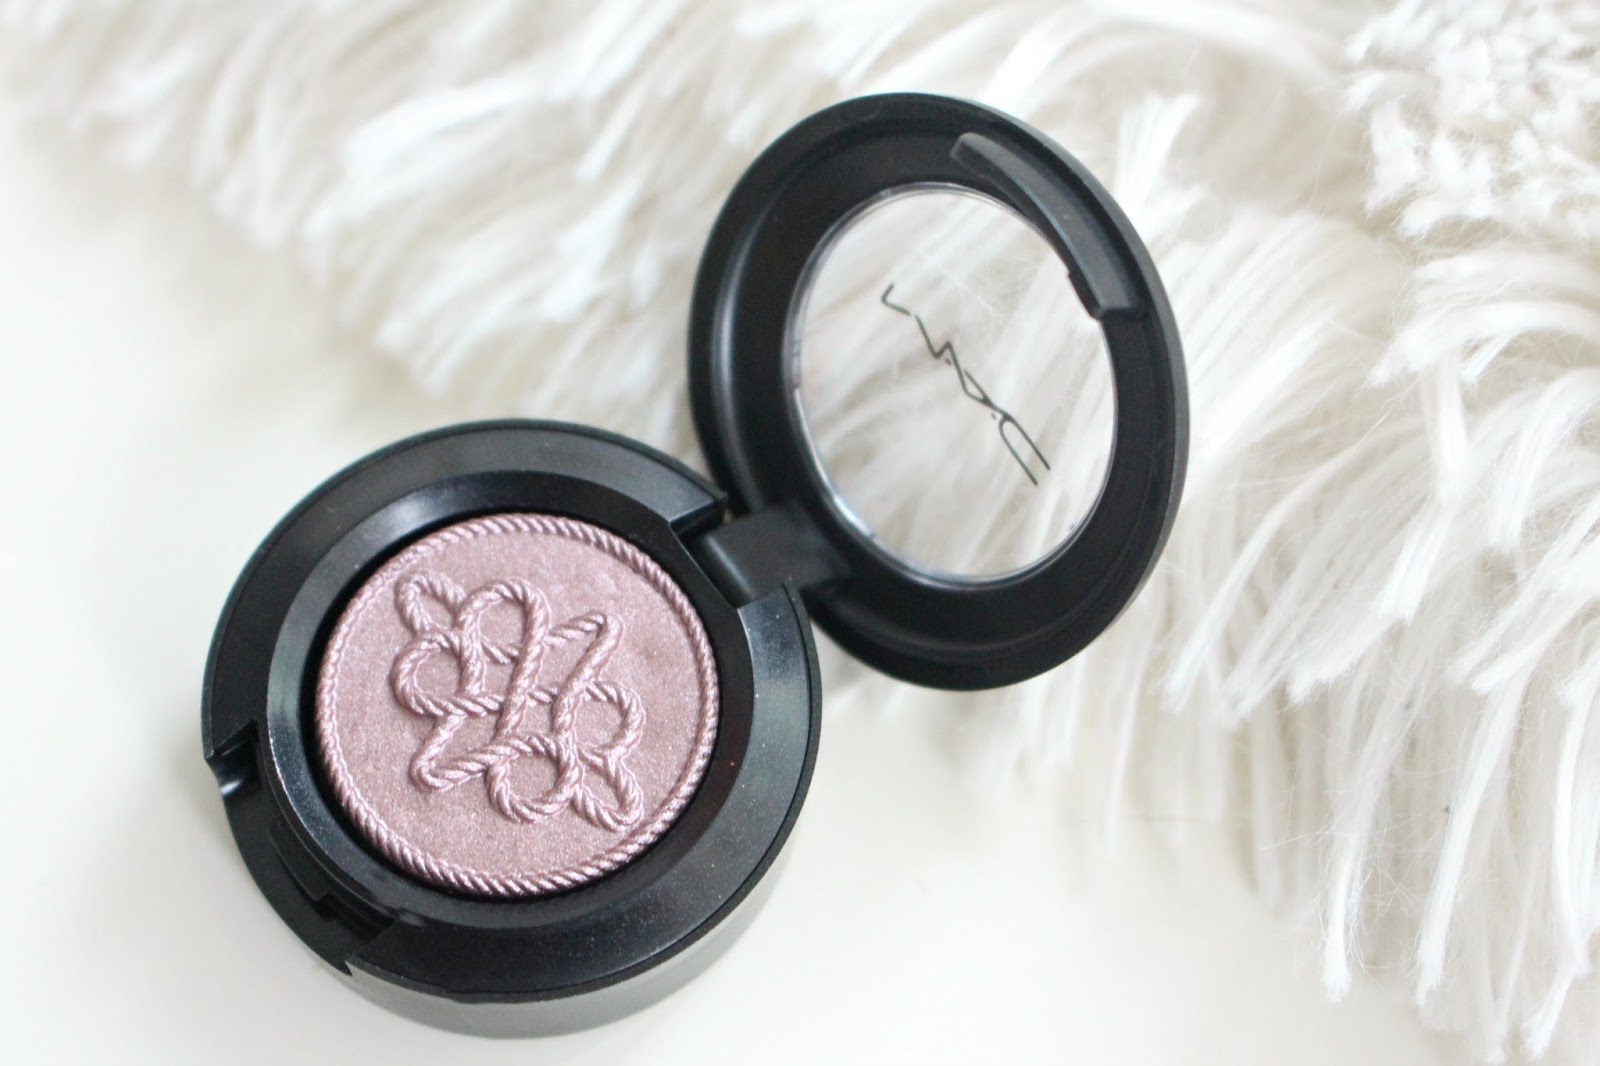 MAC Nutcracker Sweet Plum Eye Bag Swatches | Samantha Jane